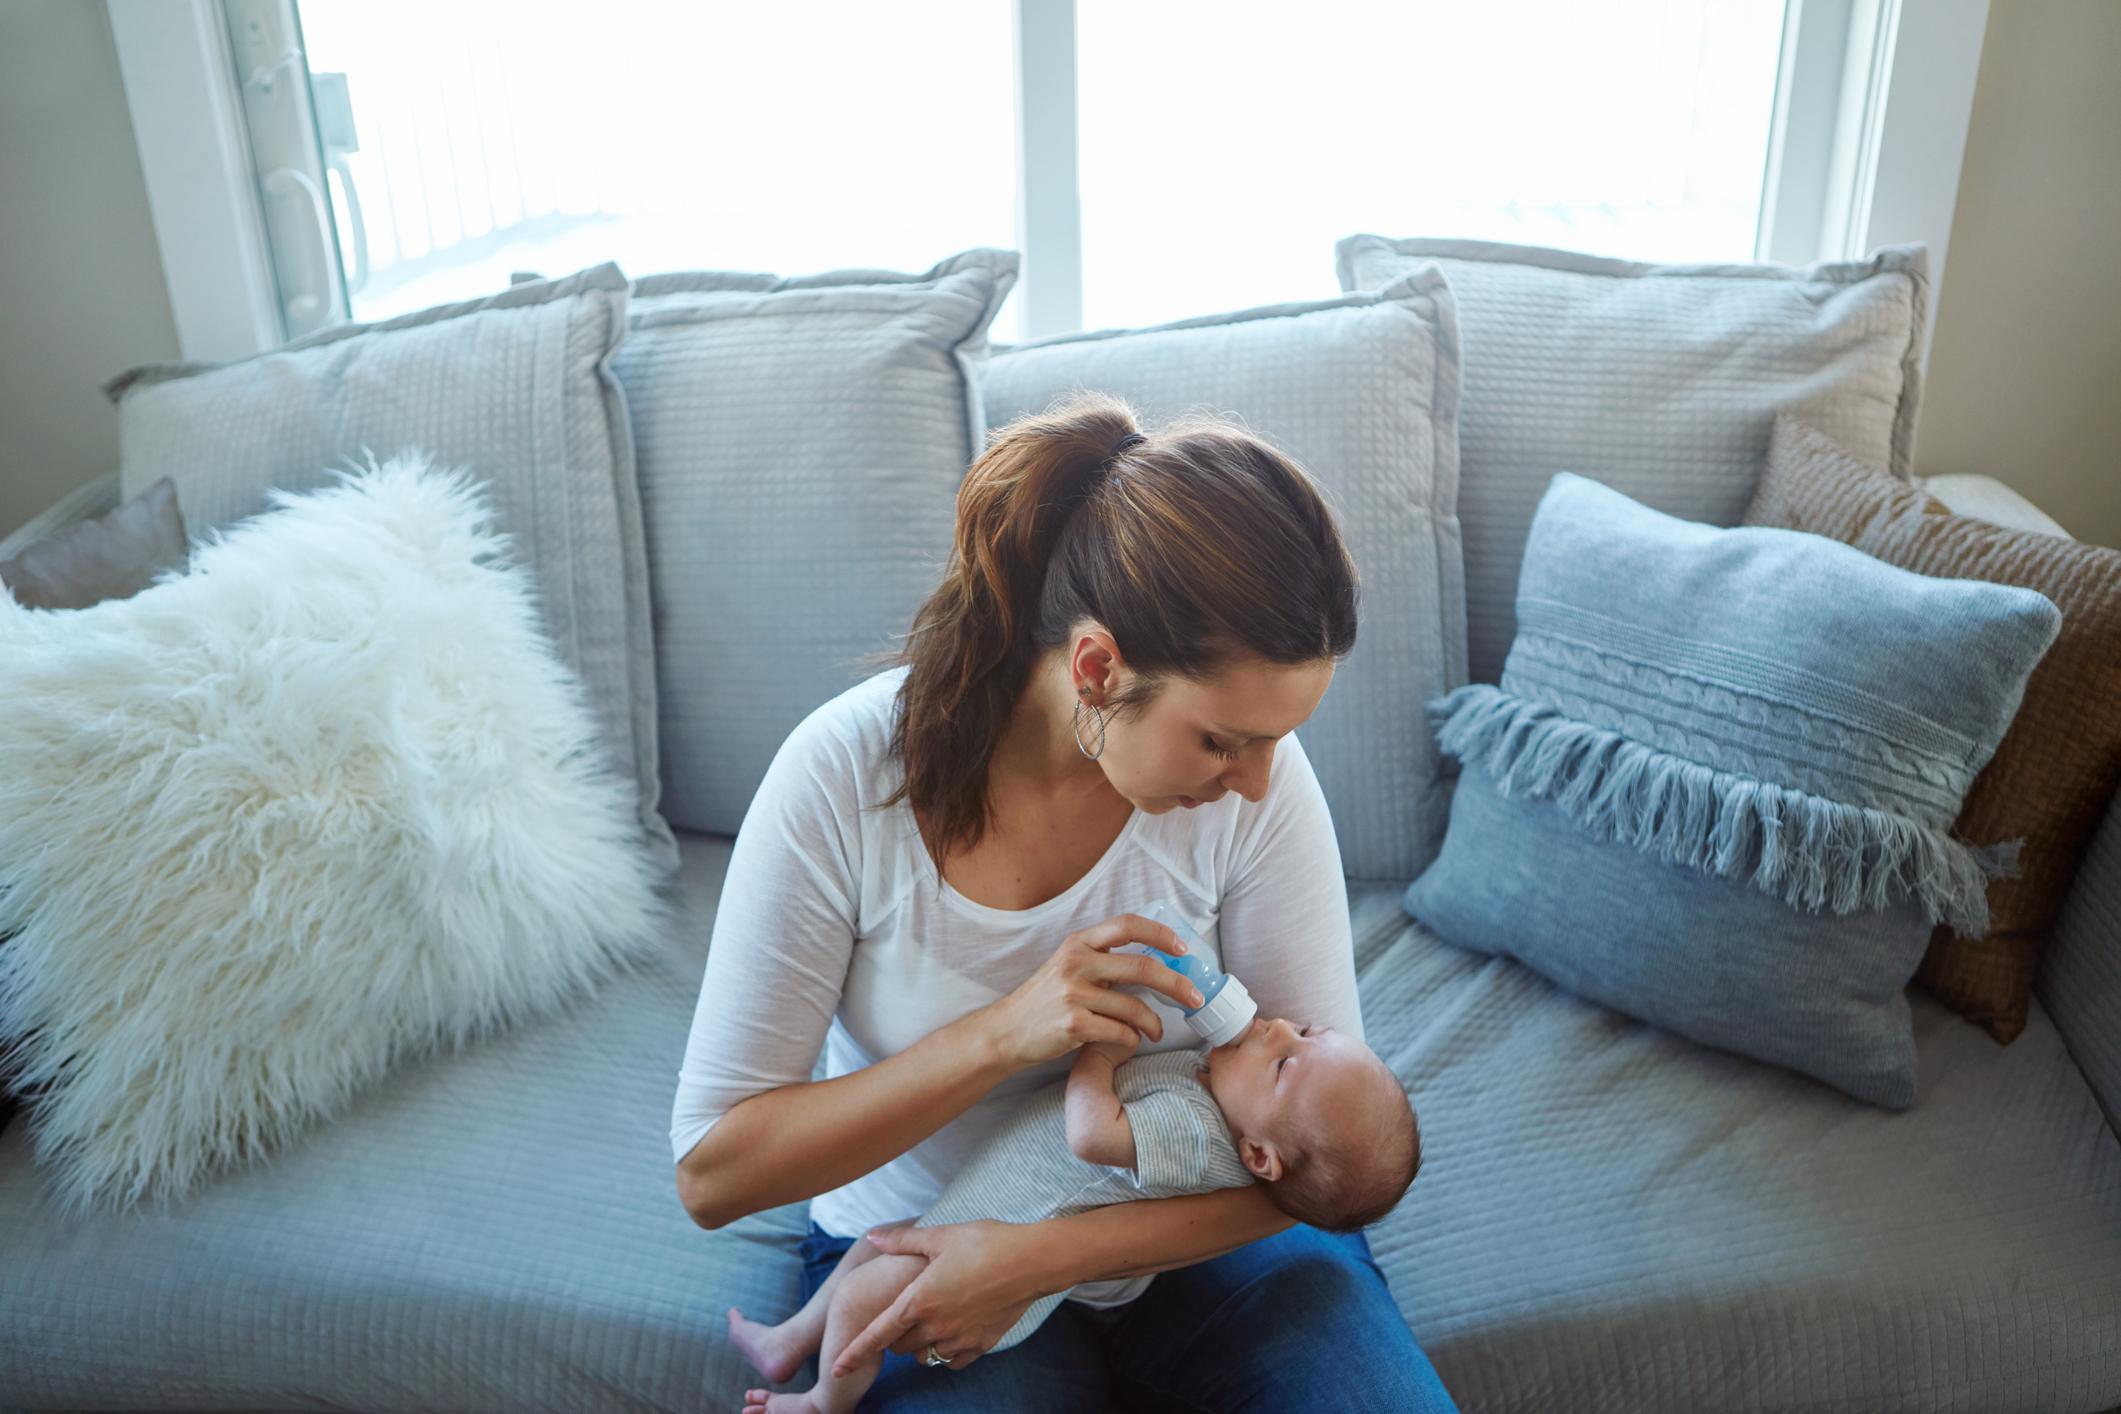 To the Formula Feeding Mom During World Breastfeeding Week